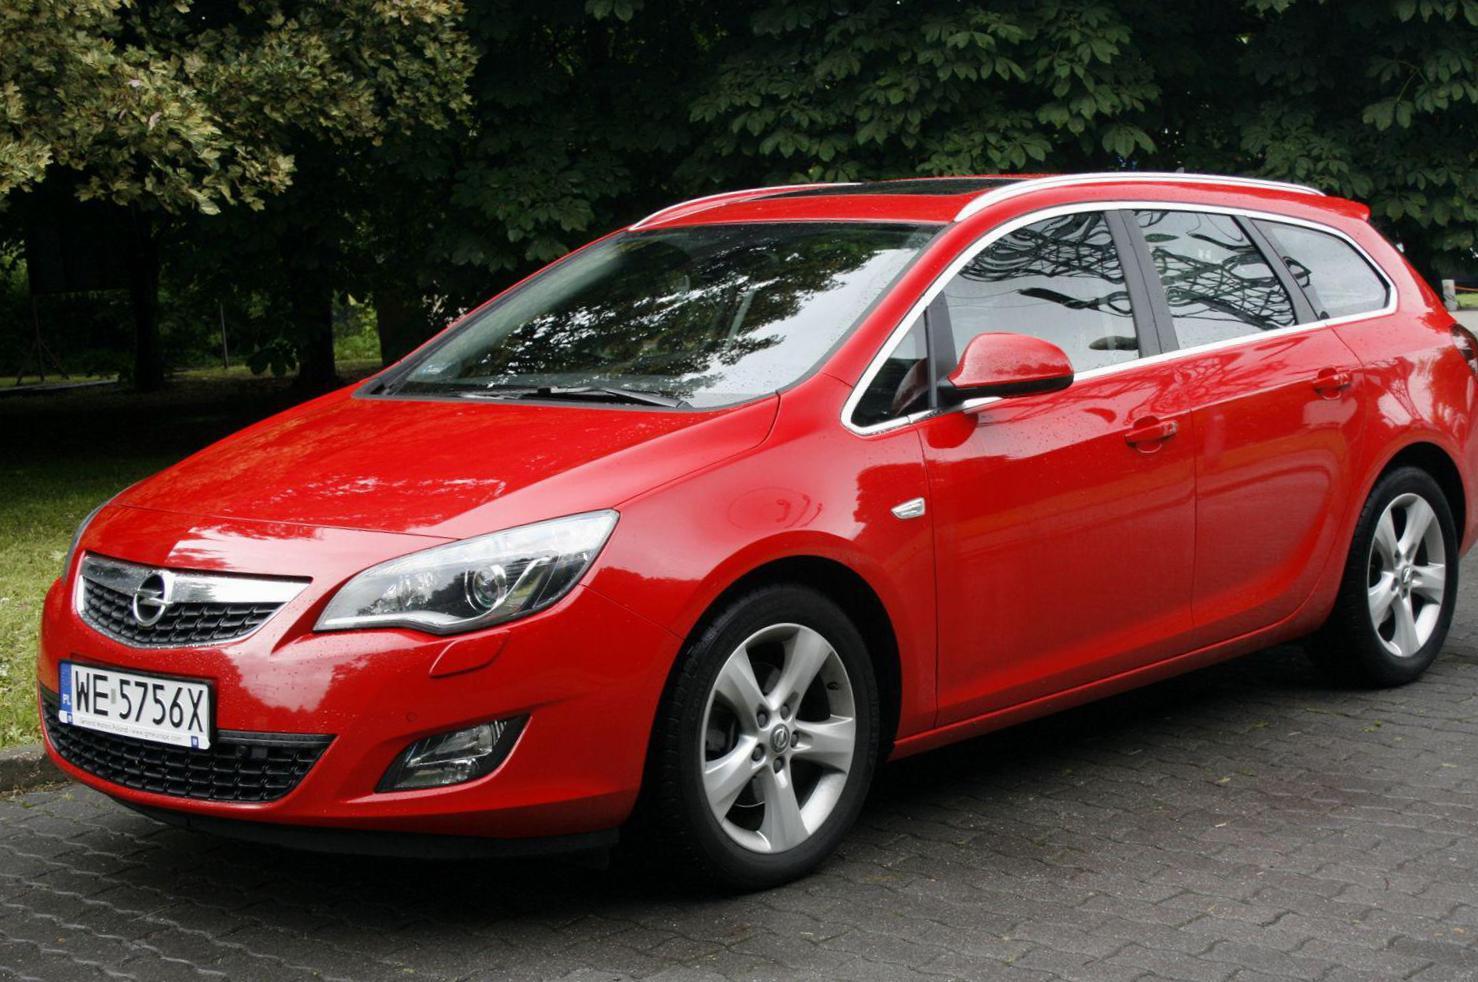 Opel Astra J Sports Tourer Photos And Specs Photo Astra J Sports Tourer Opel Used And 23 Perfect Photos Of Opel Astra J Sports Tourer